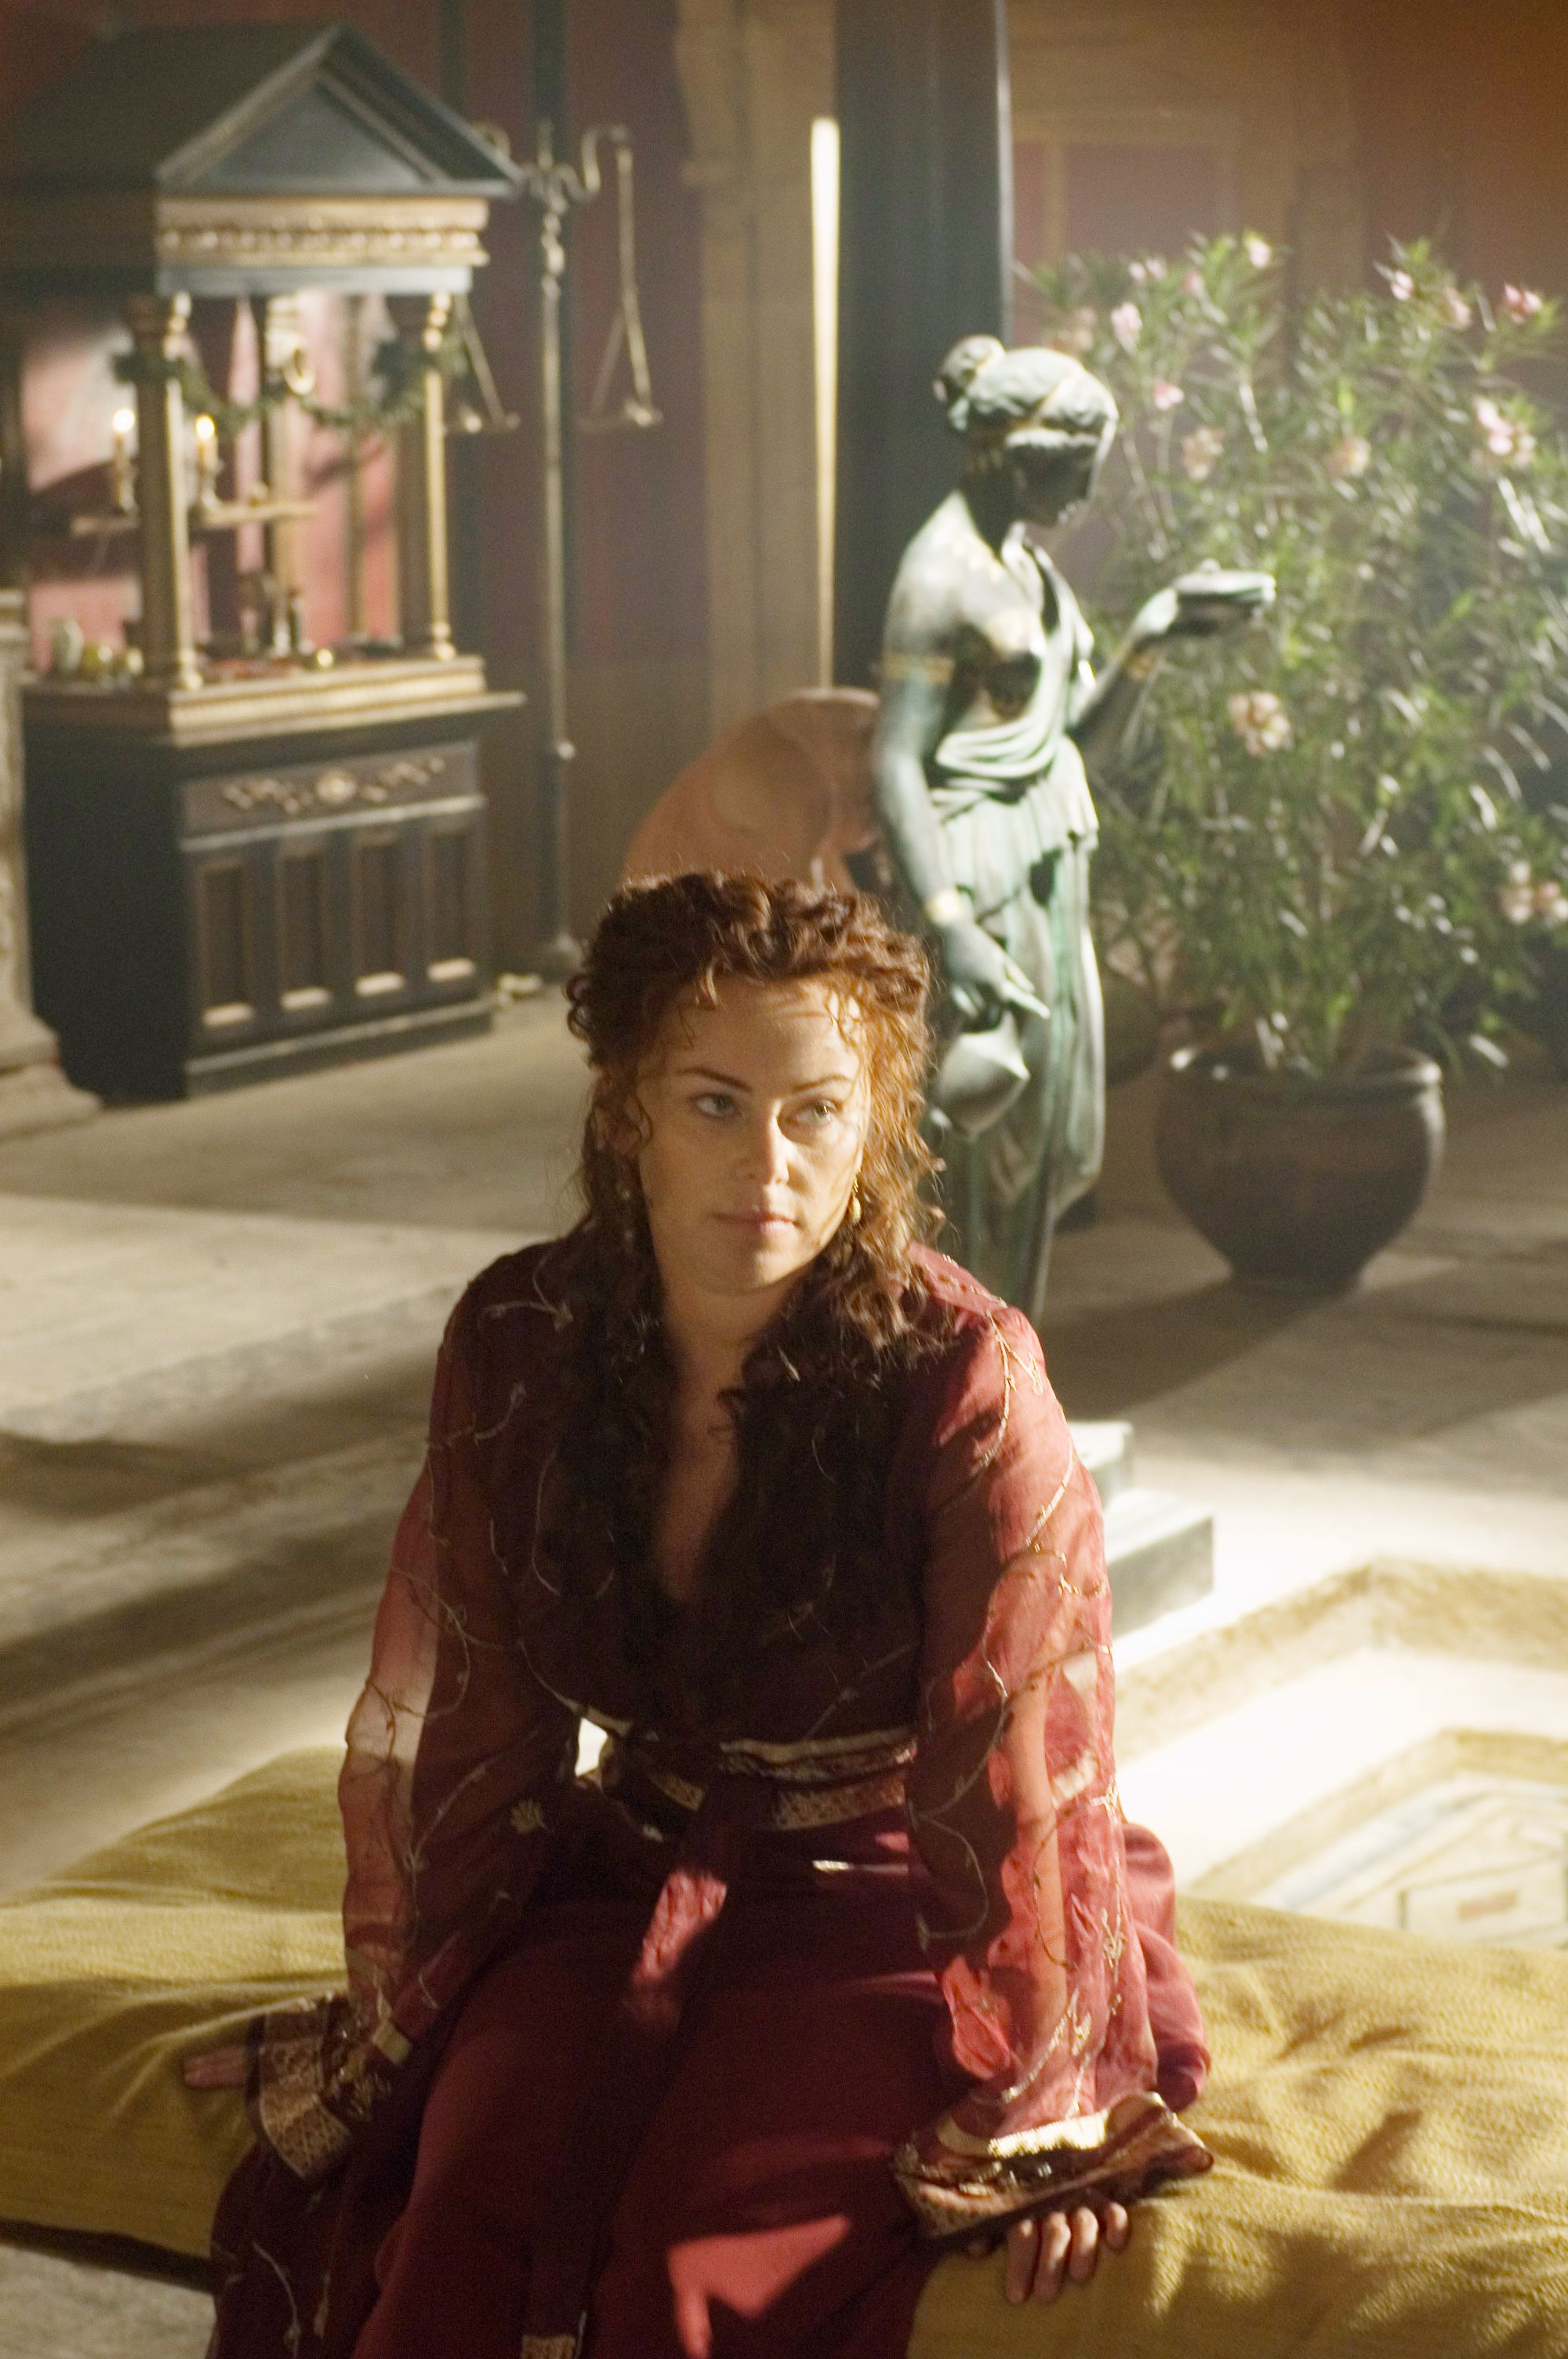 Rome TV Series - Season 2 Episode 8 Still